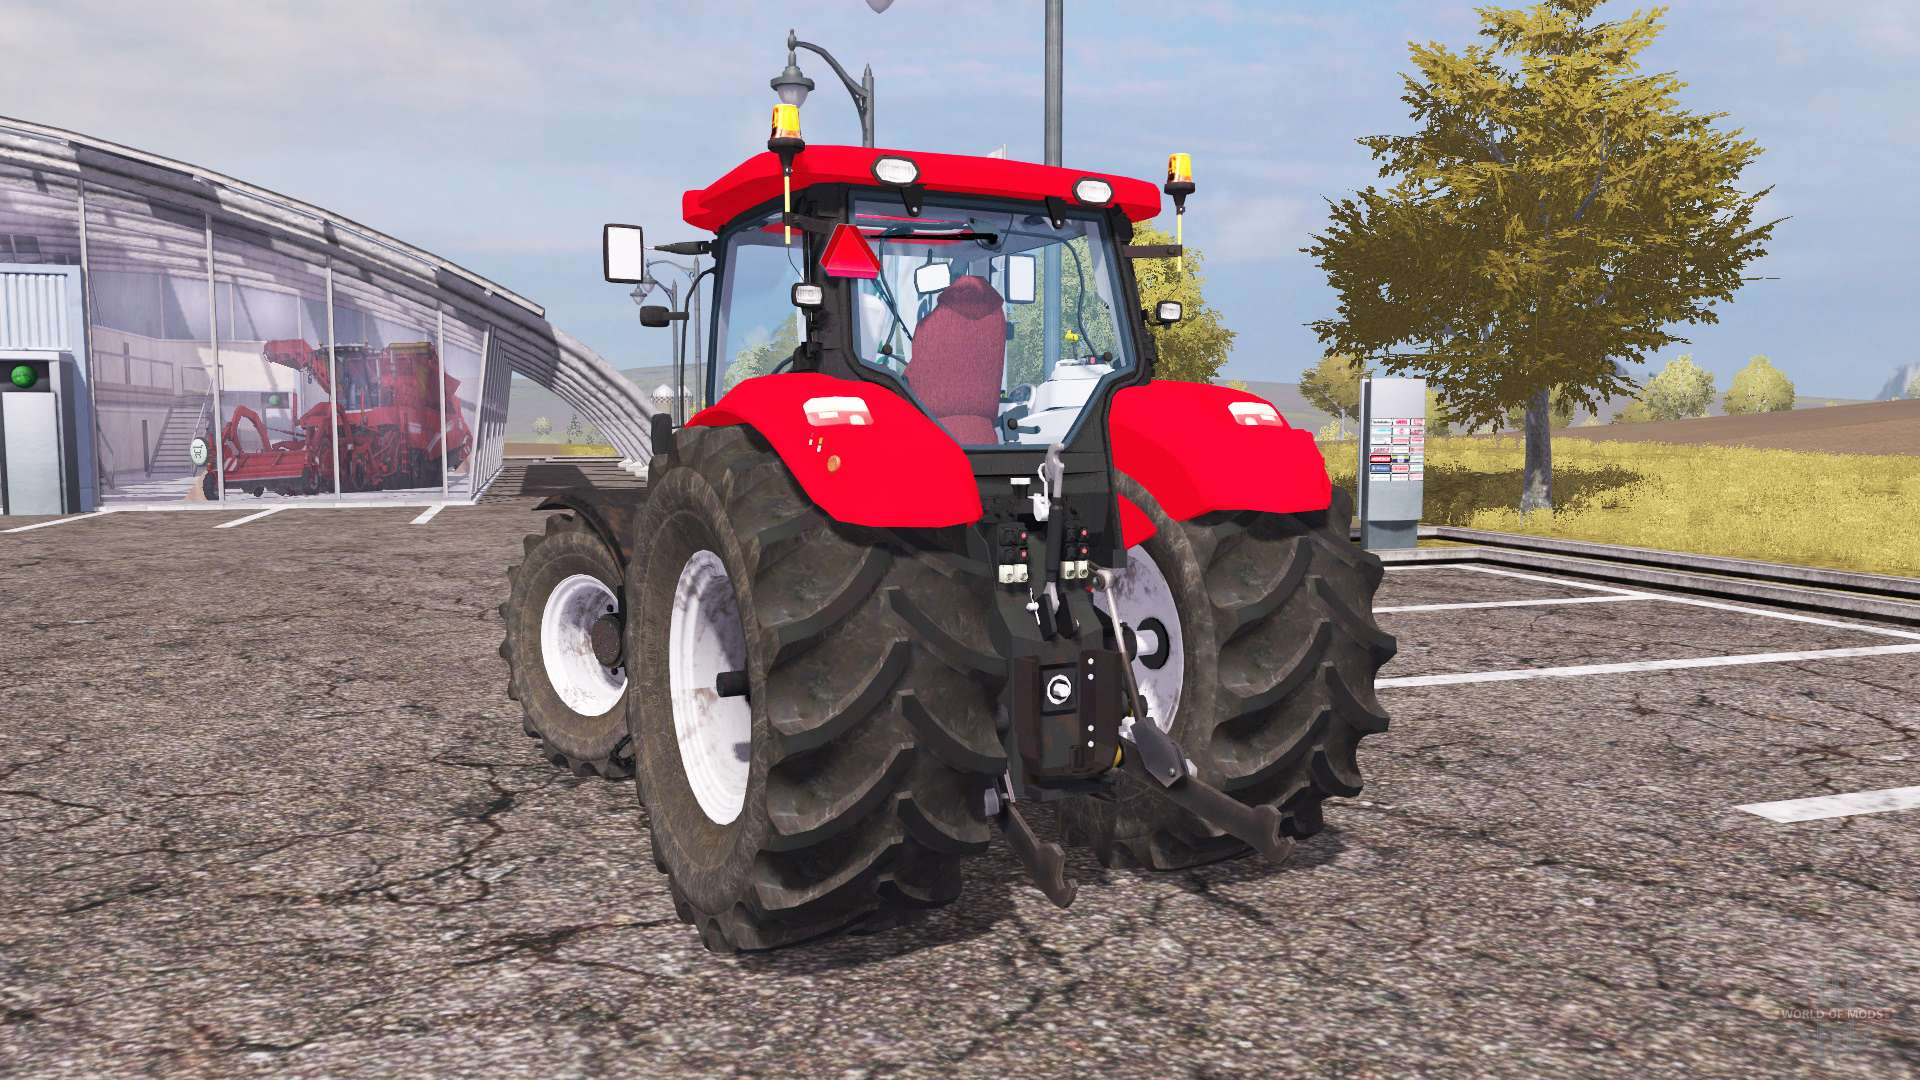 Mtx 135 for farming simulator 2013 mccormick mtx 135 for farming simulator 2013 publicscrutiny Gallery